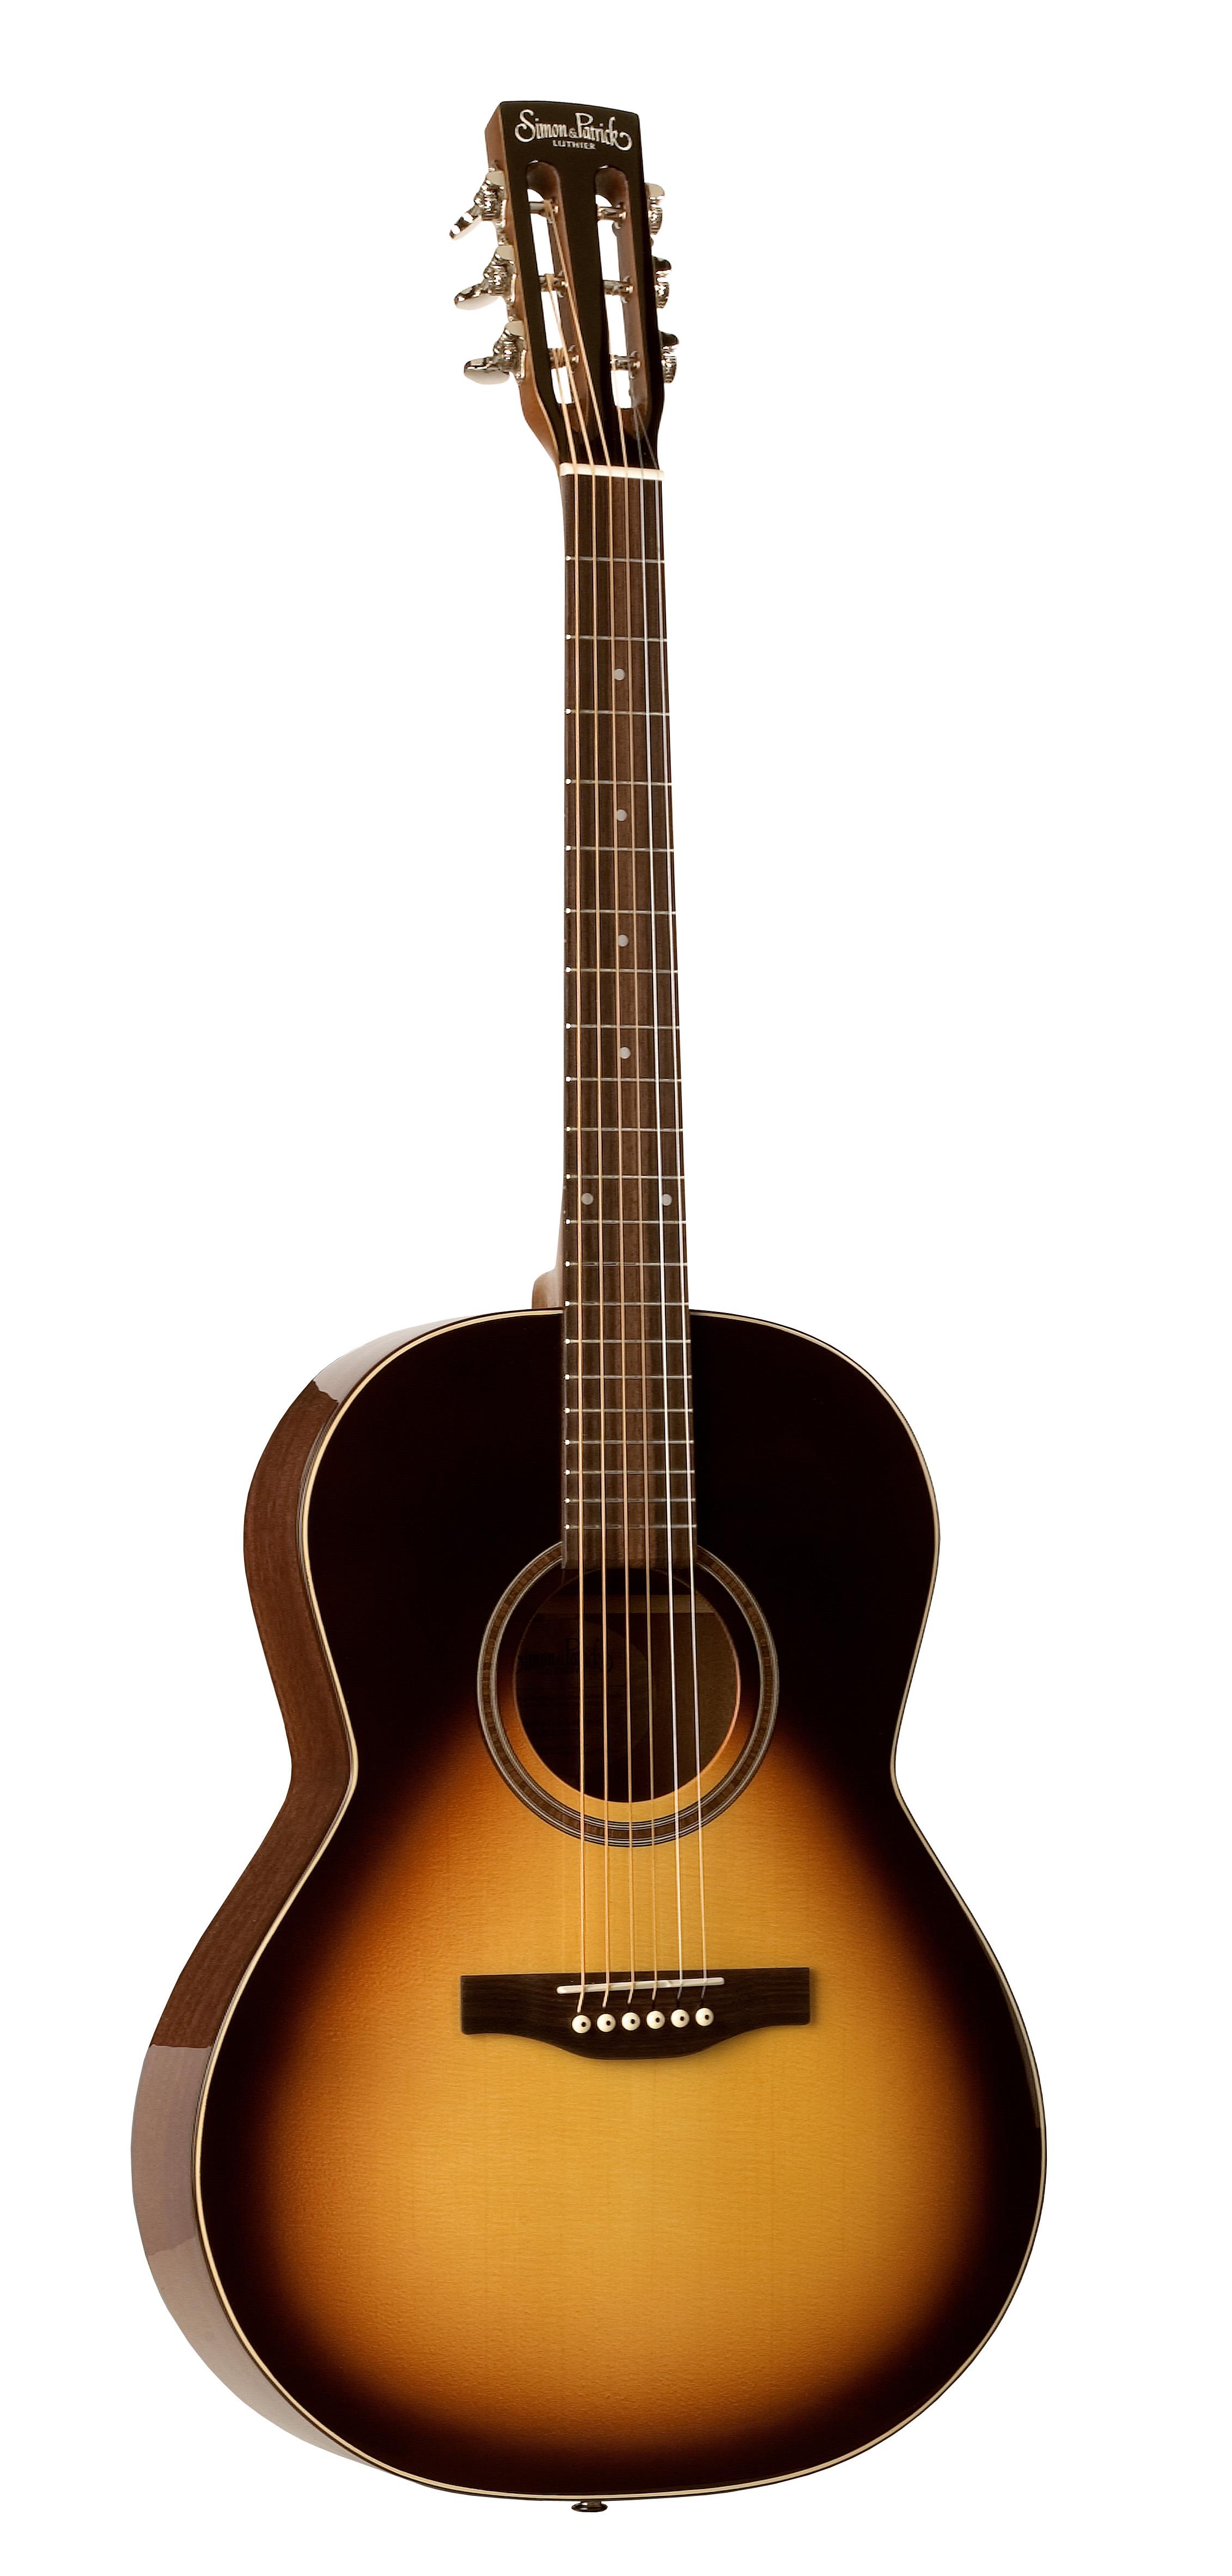 Simon & Patrick 34598 Woodland Pro Folk Sunburst Acoustic Guitar